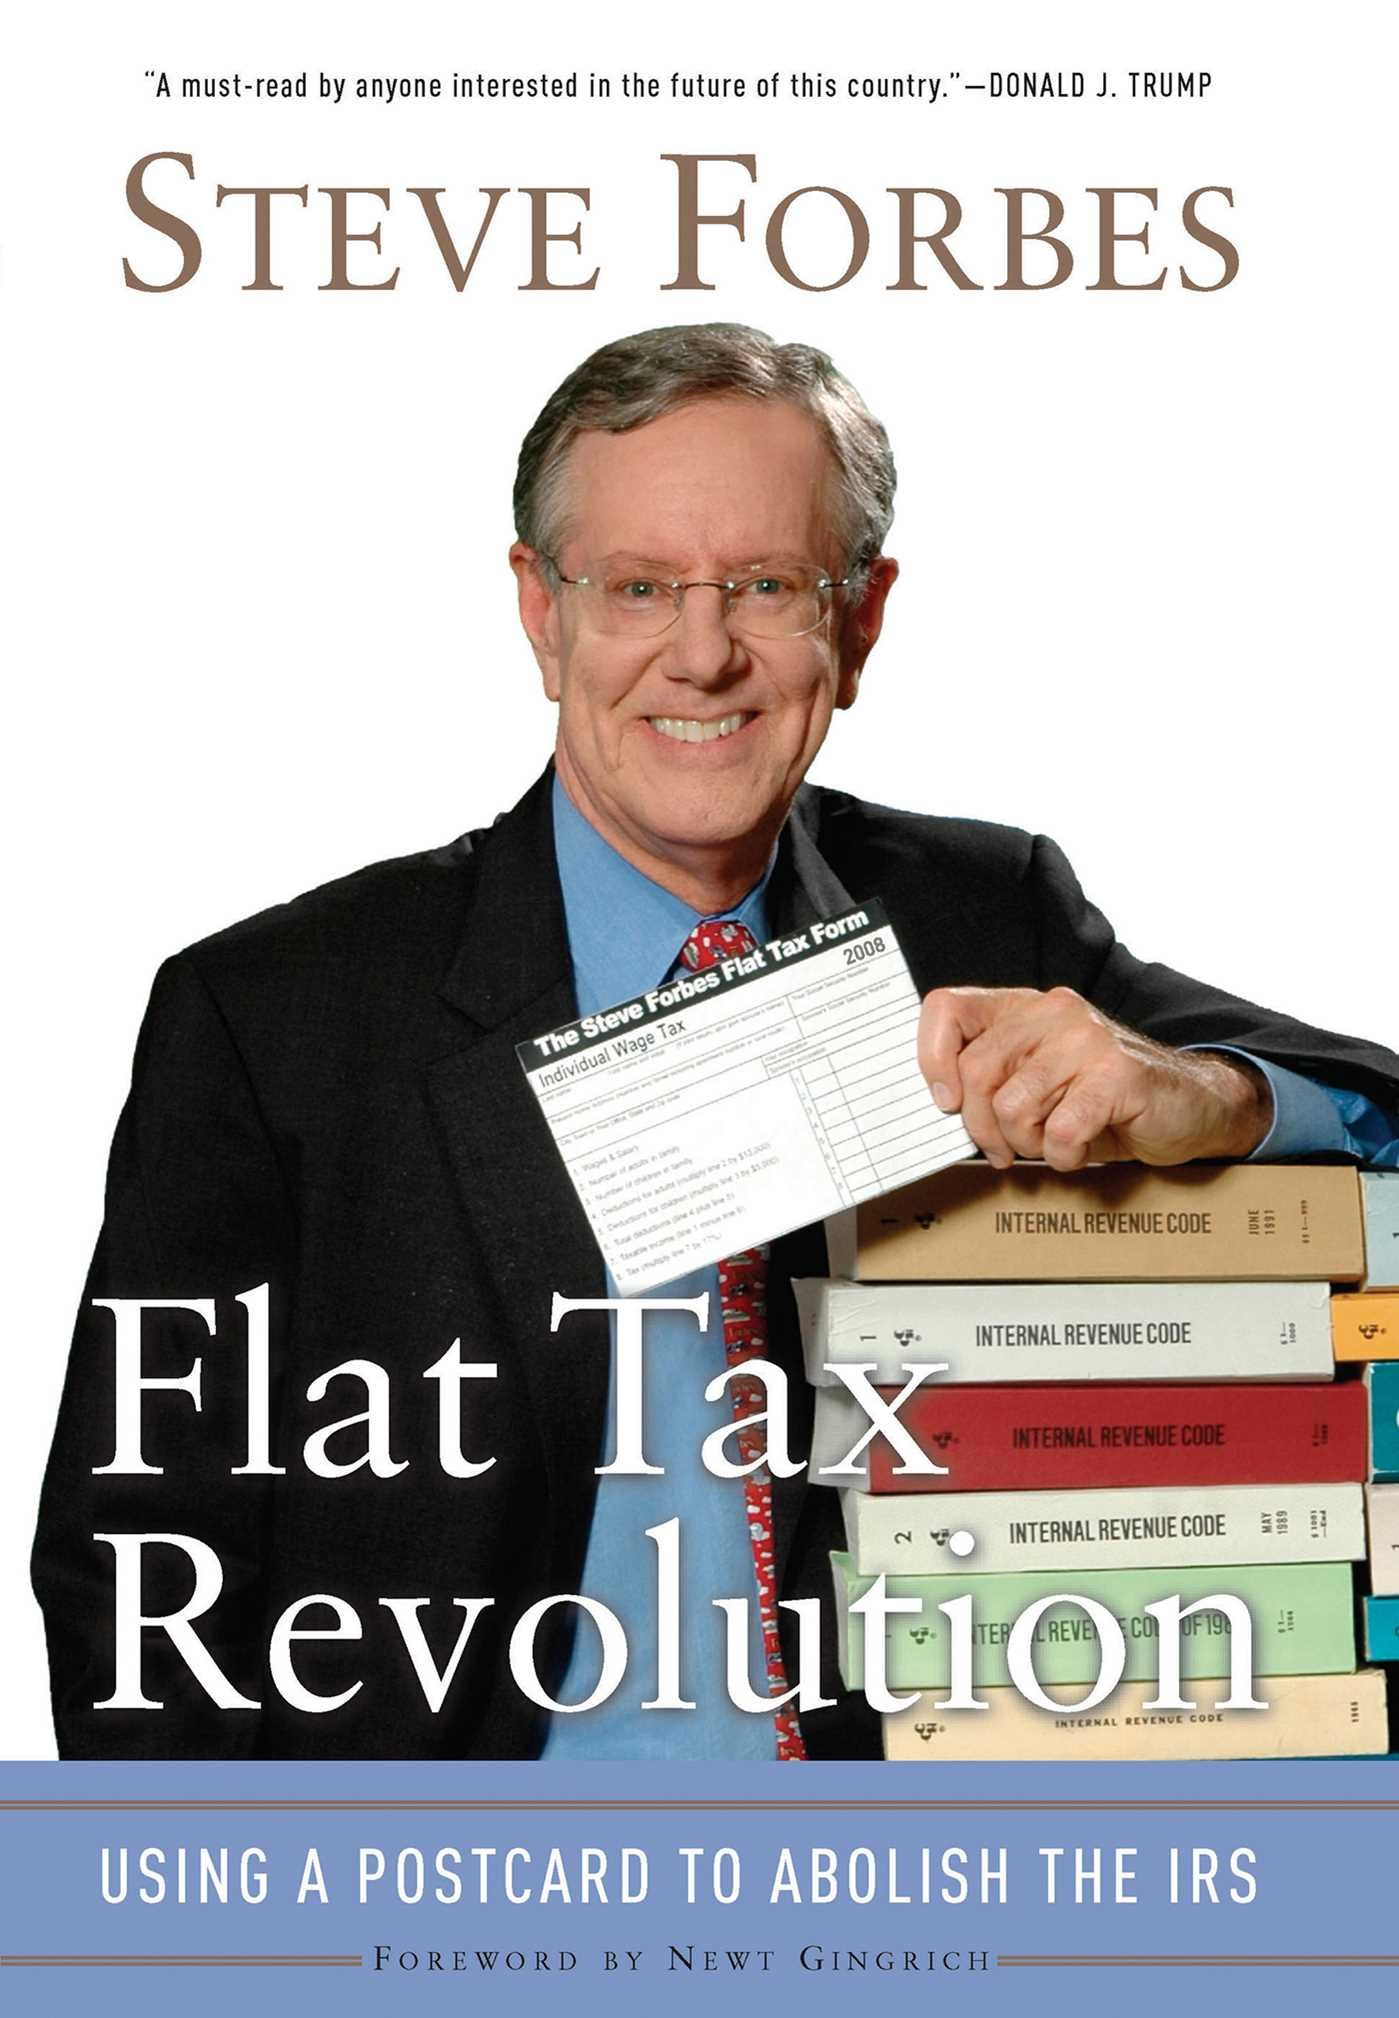 Flat Tax Revolution: Using a Postcard to Abolish the IRS: Steve Forbes:  9780895260406: Amazon.com: Books